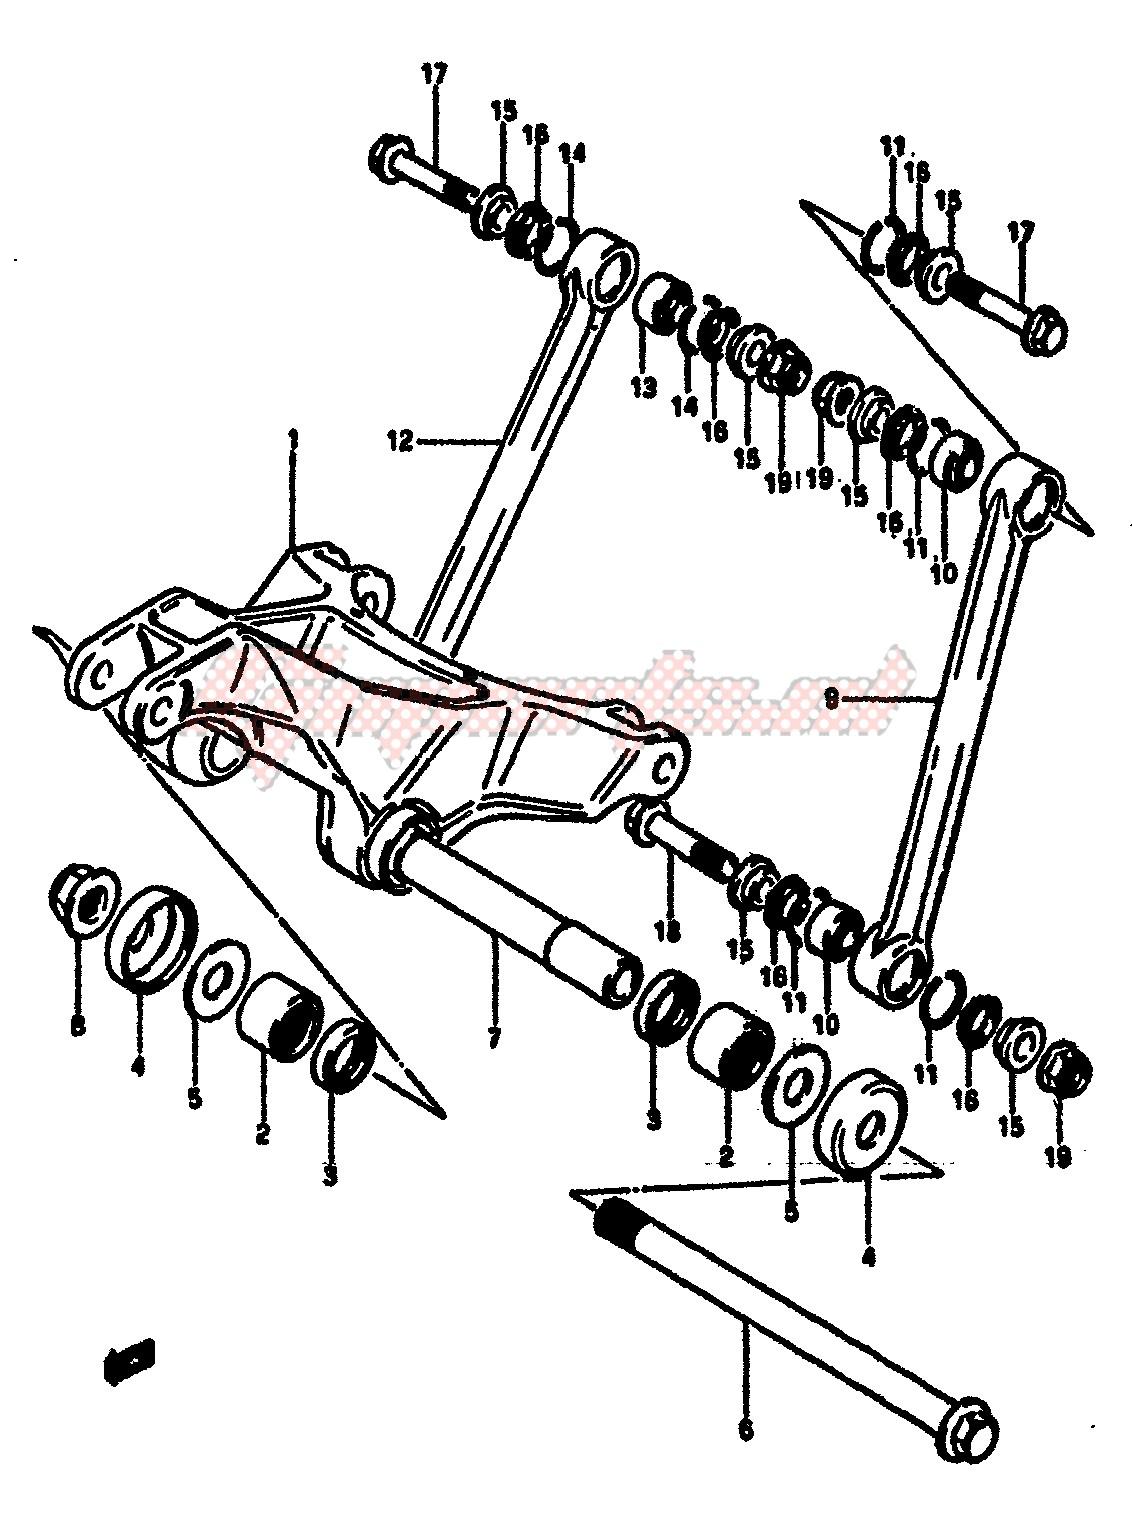 CUSHION LEVER blueprint